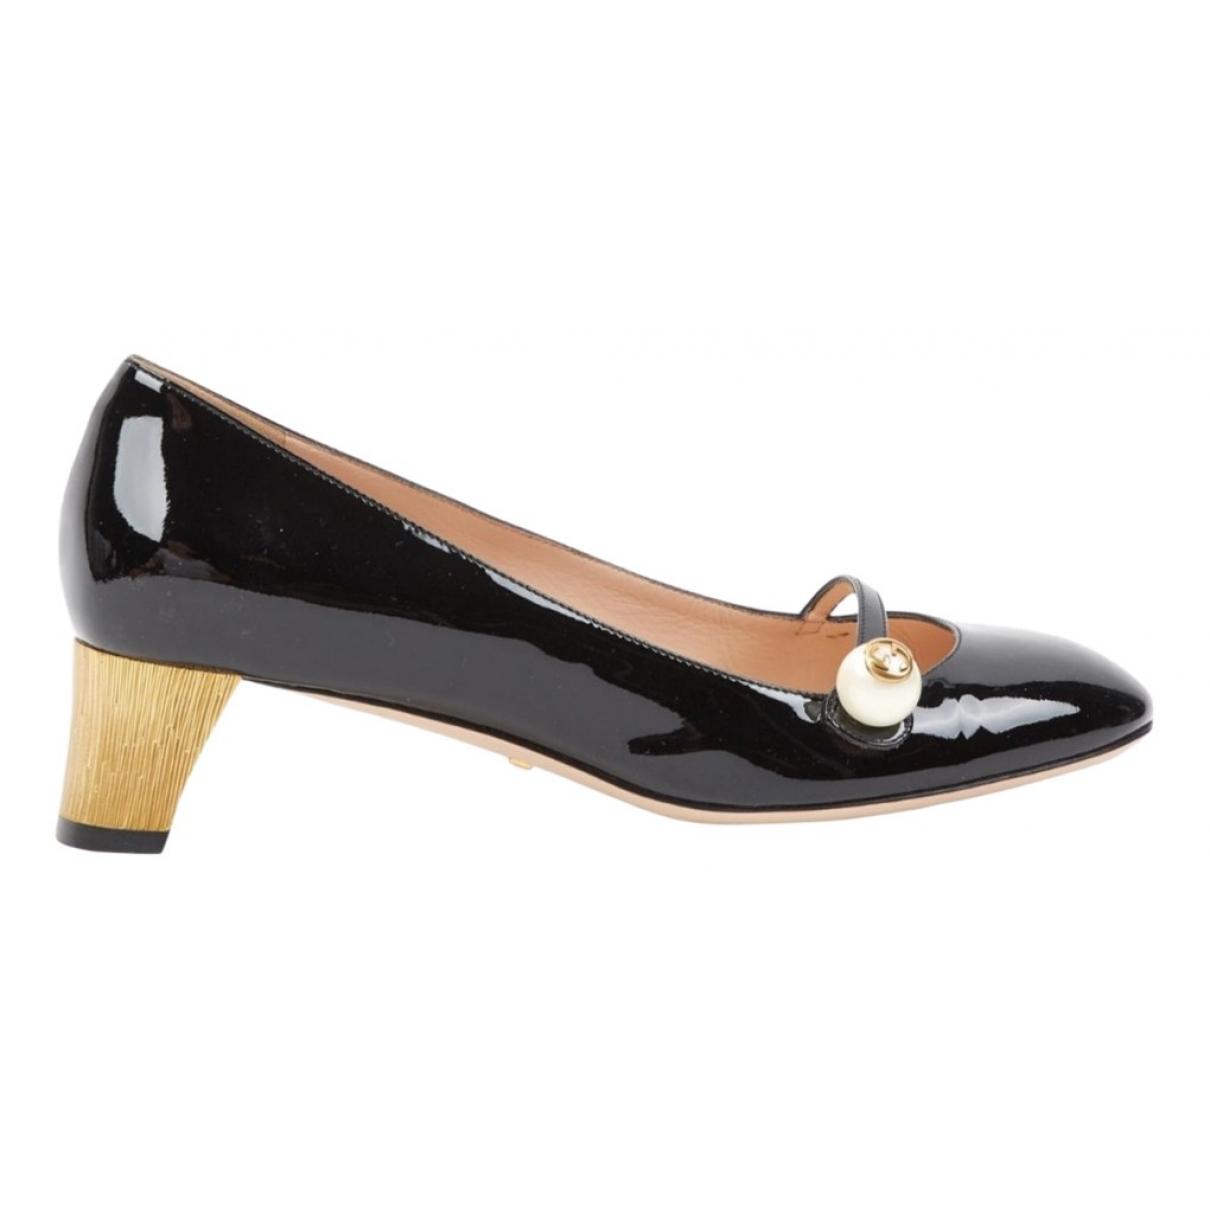 Gucci Arielle Black Patent leather Heels for Women 37.5 EU